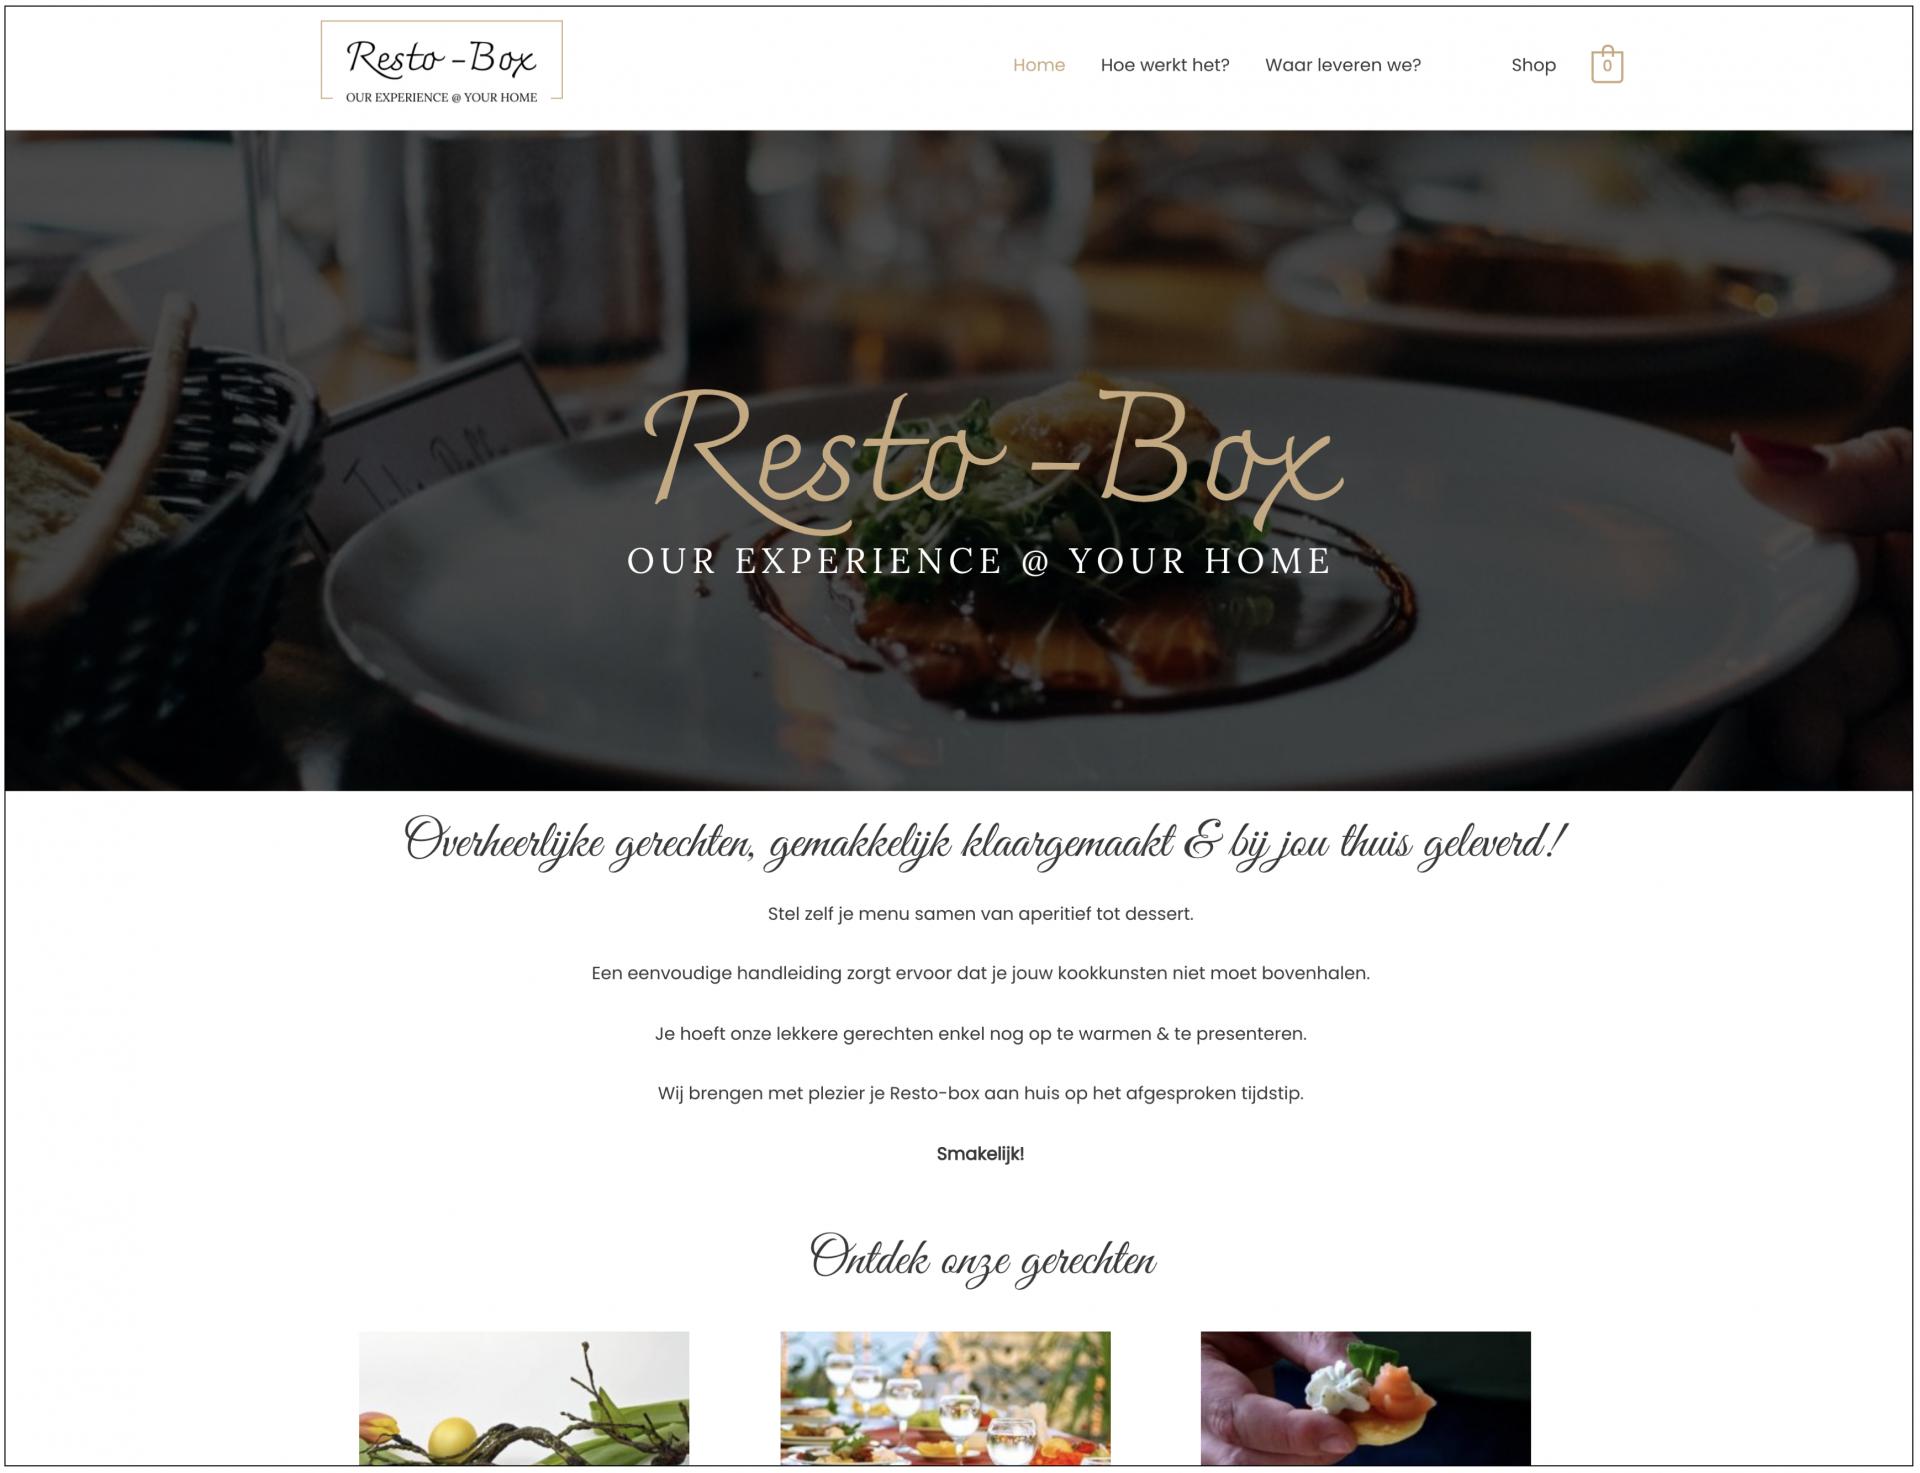 Resto-Box.be